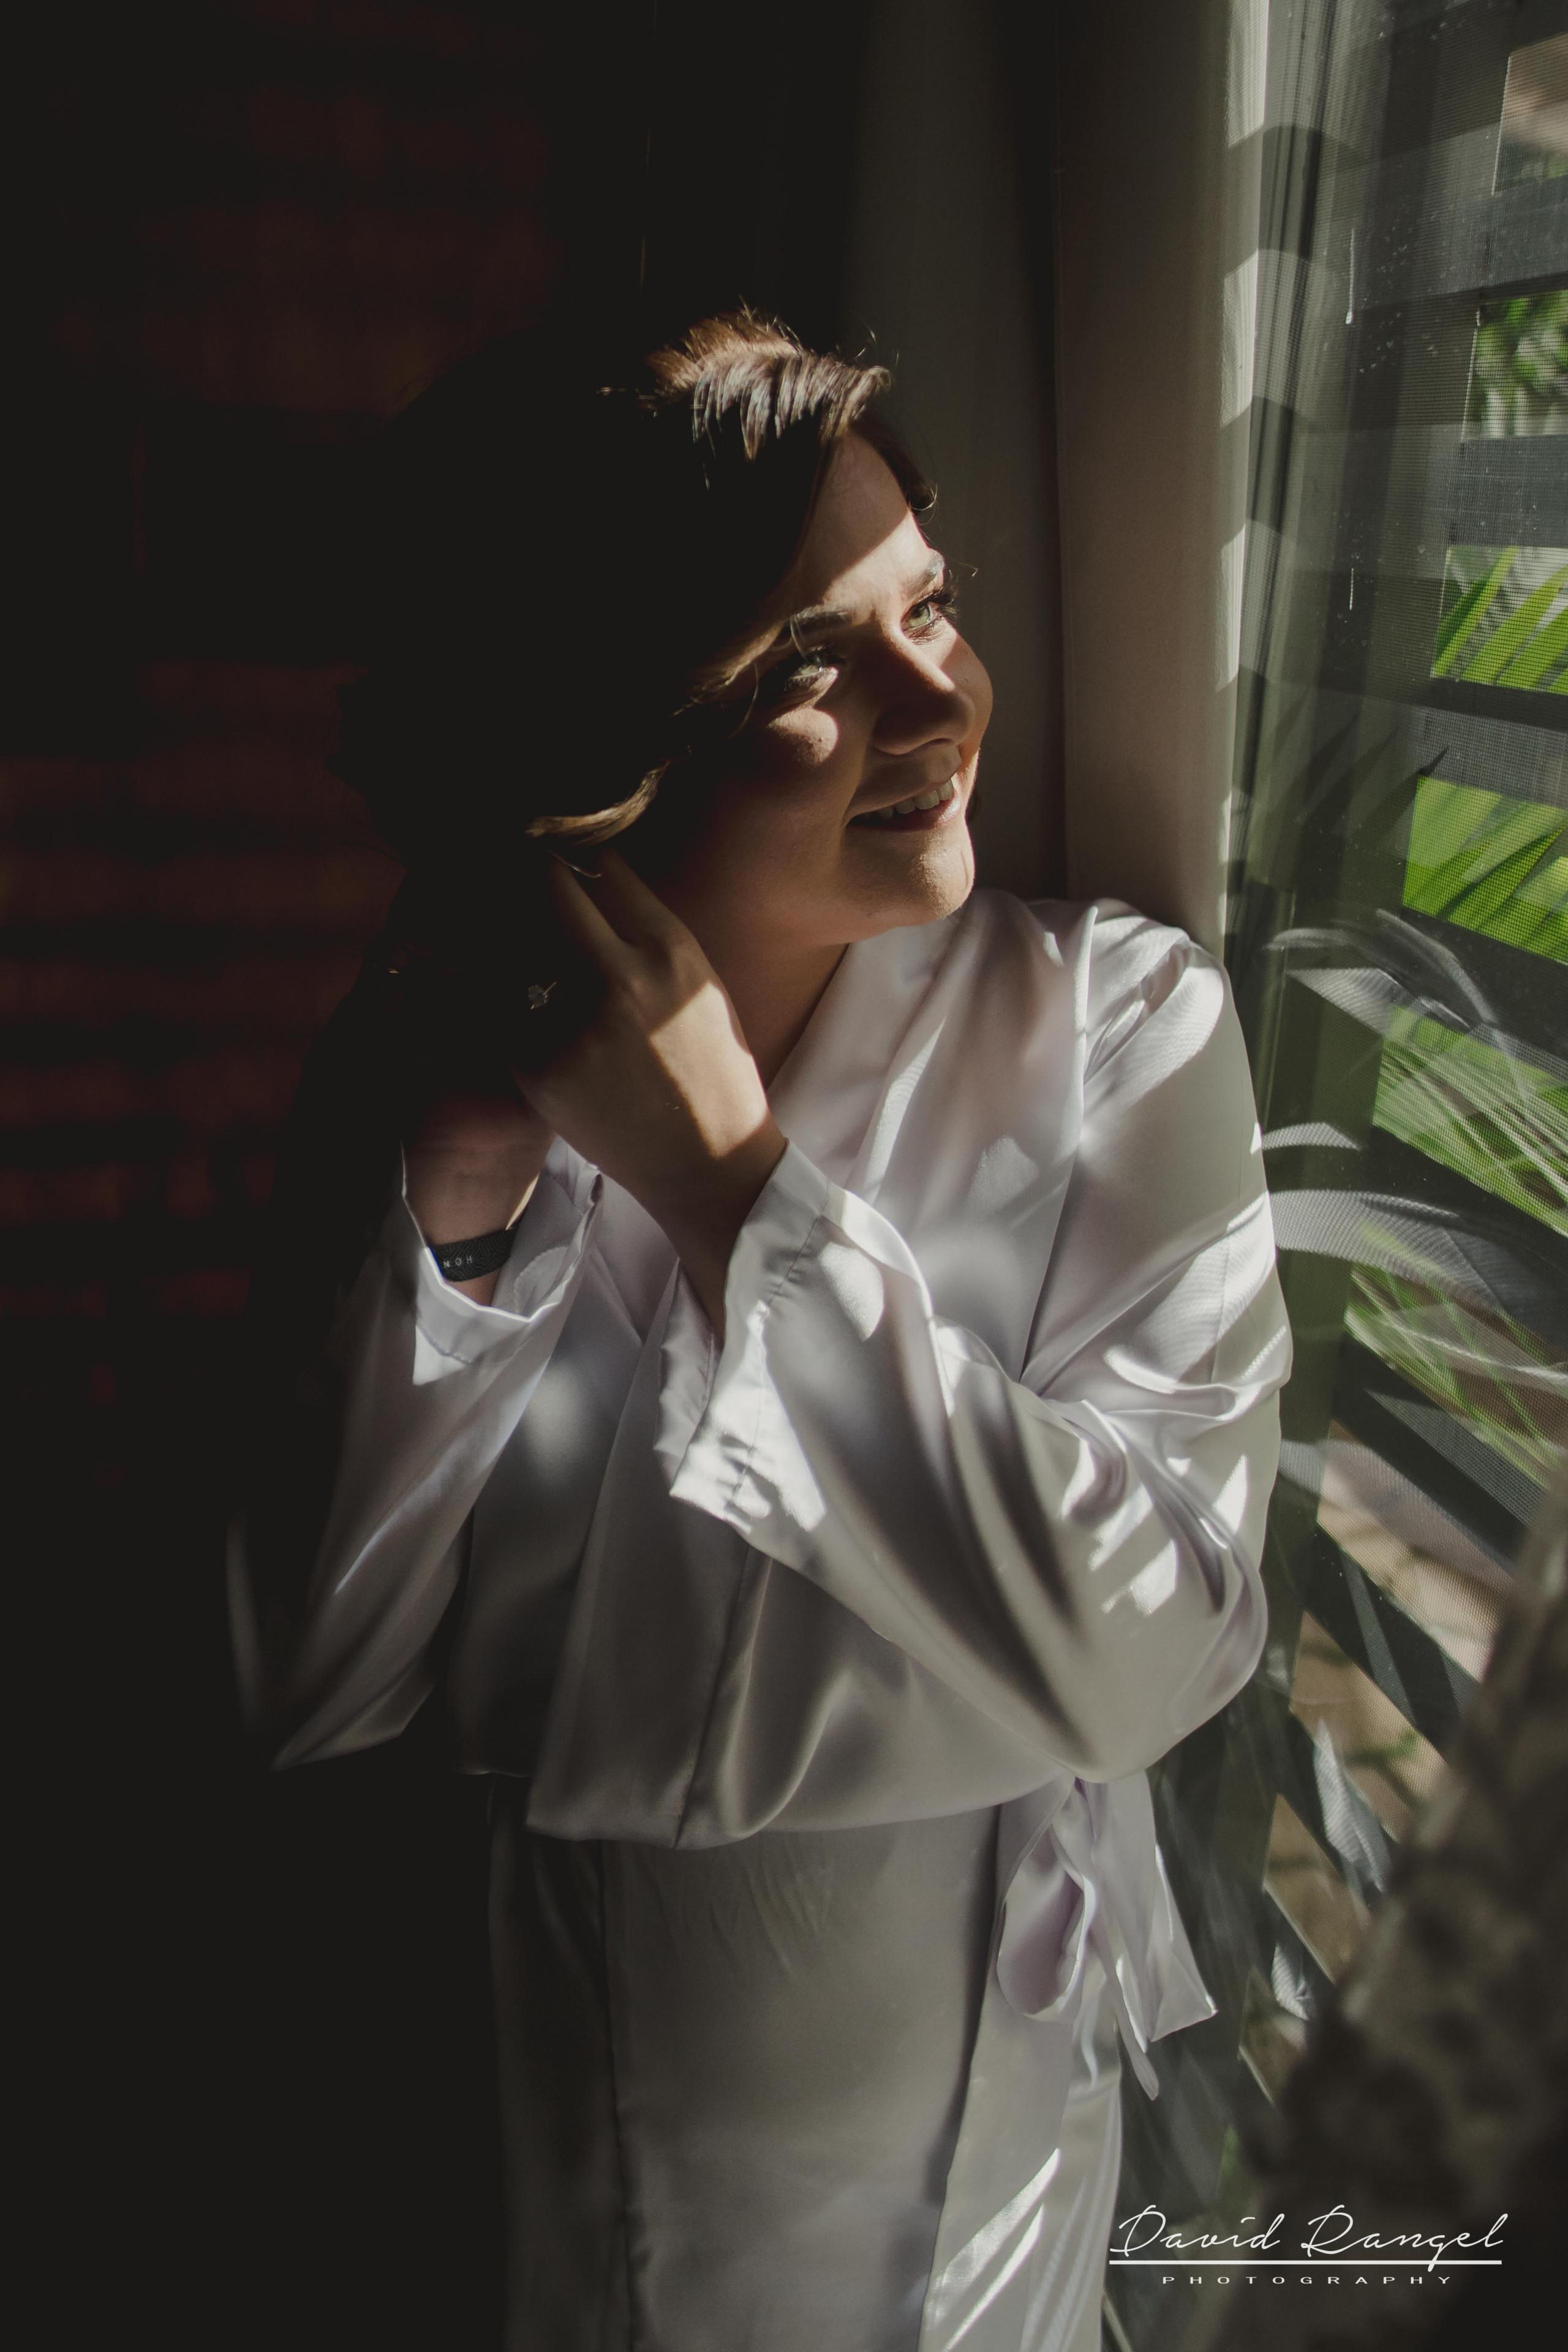 bride+getting+ready+shadow+earring++bathrobe+natural+ligh+photo+destination+wedding+isla+blanca+smile